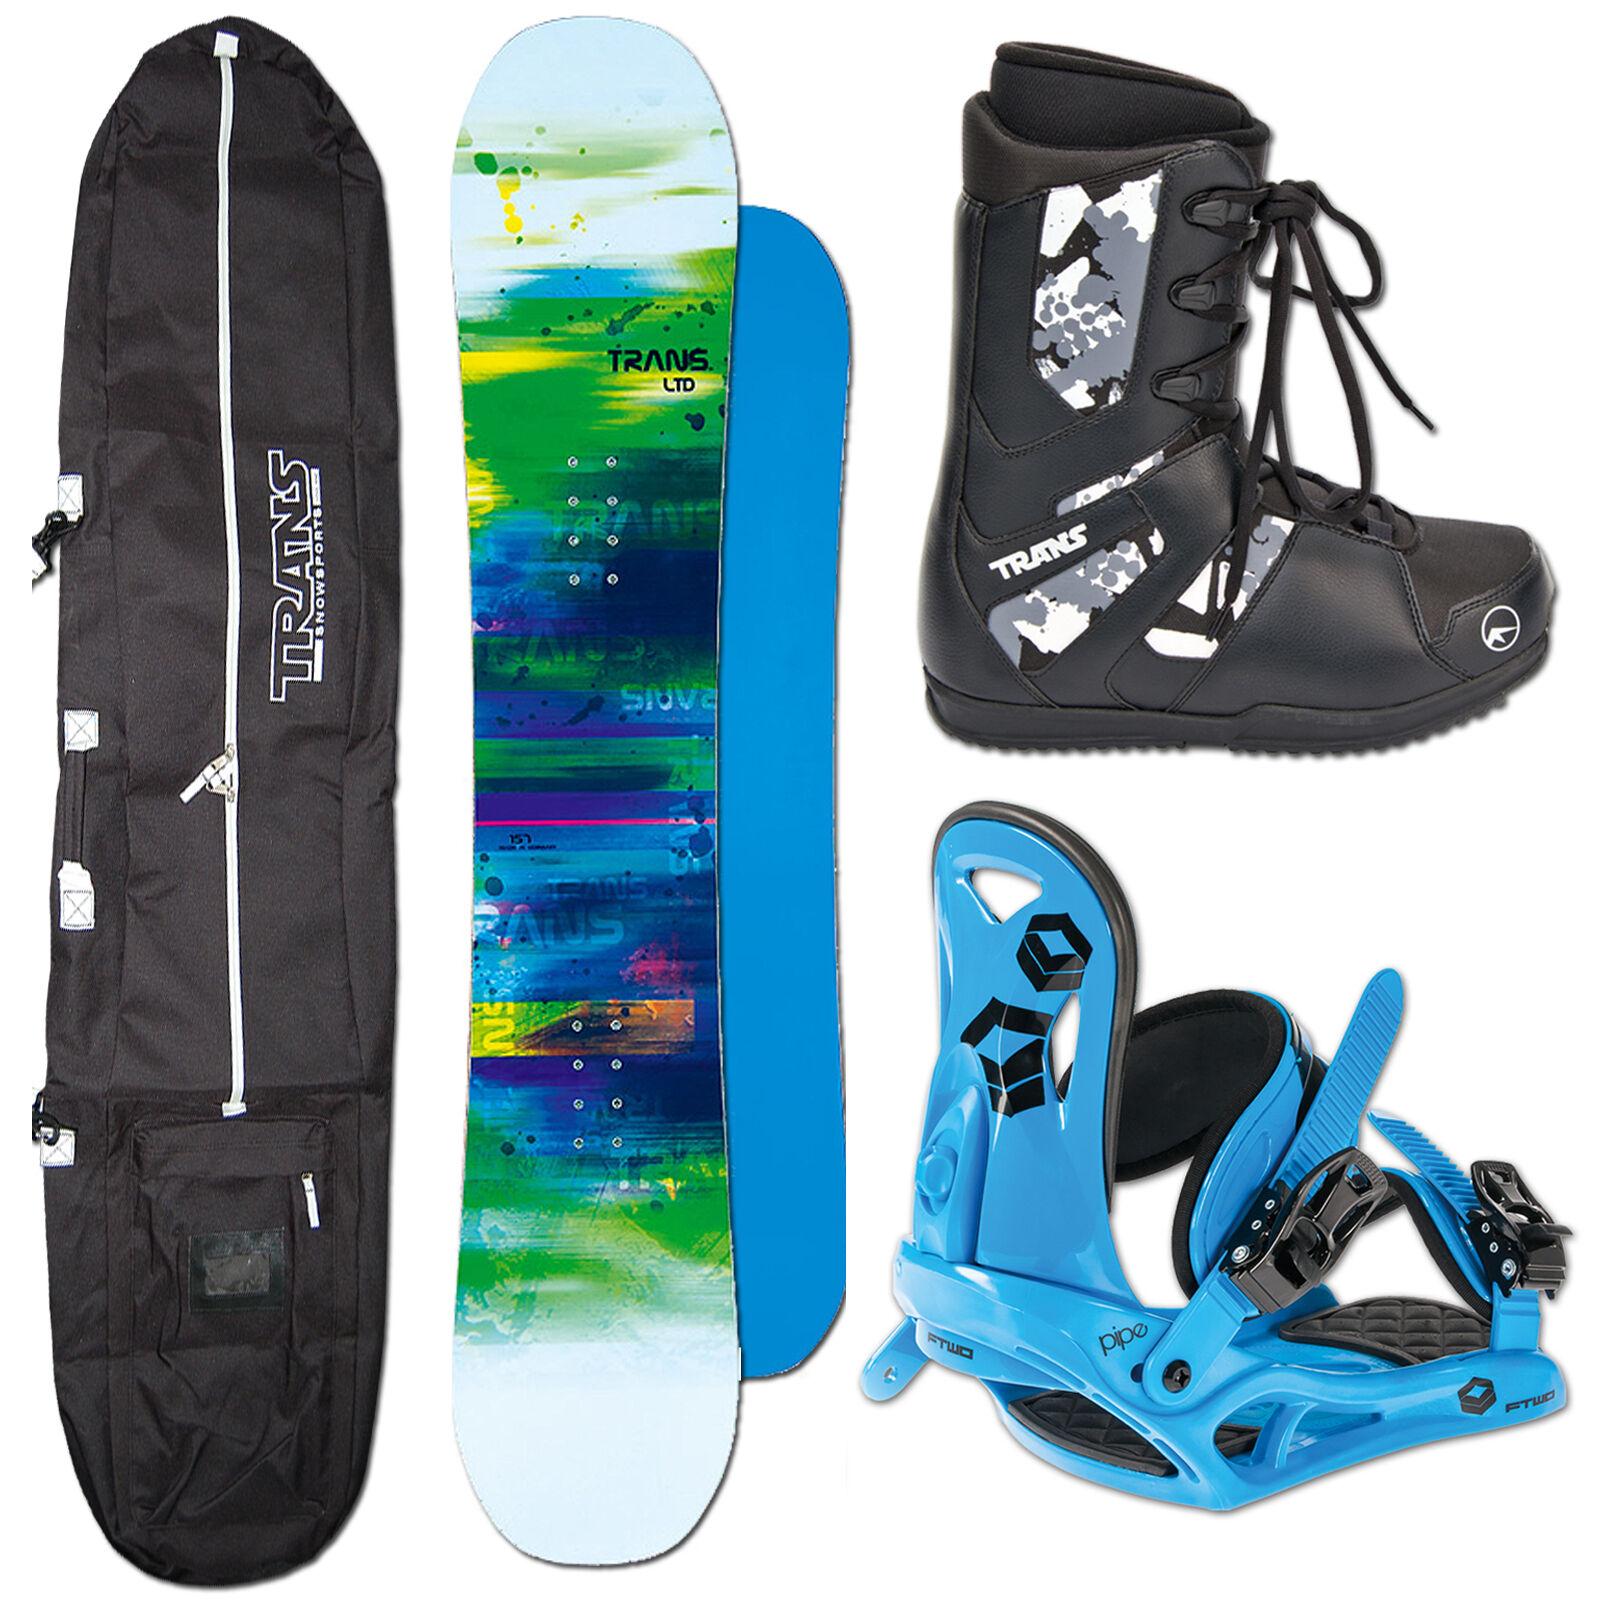 Men's Snowboard Trans Ltd White 139 cm + Ftwo Pipe BINDING M +Bag+ Boots